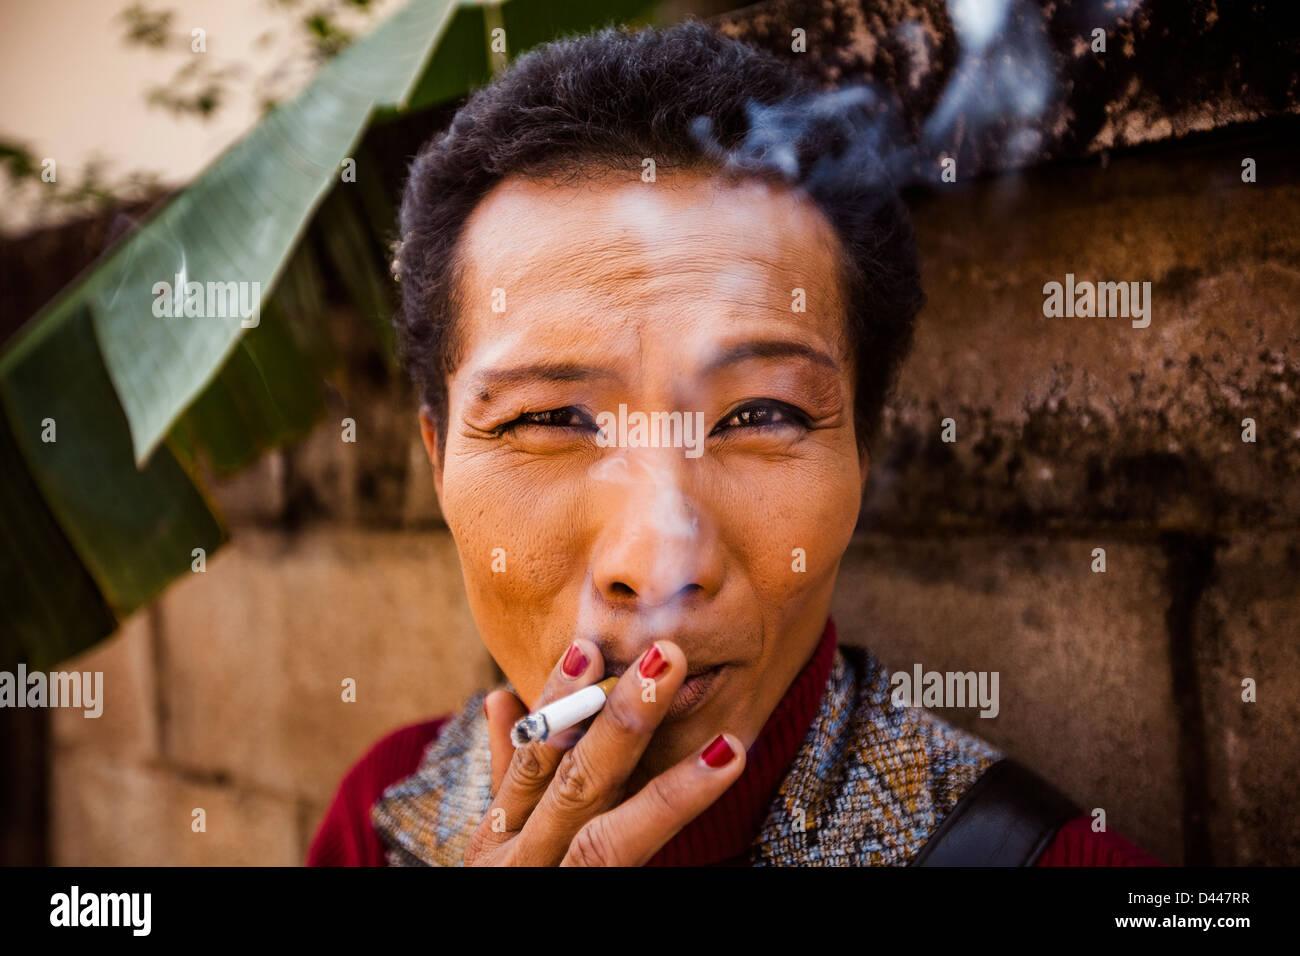 A portrait of a ladyboy in Phrae, Thailand Stock Photo: 54183691 - Alamy